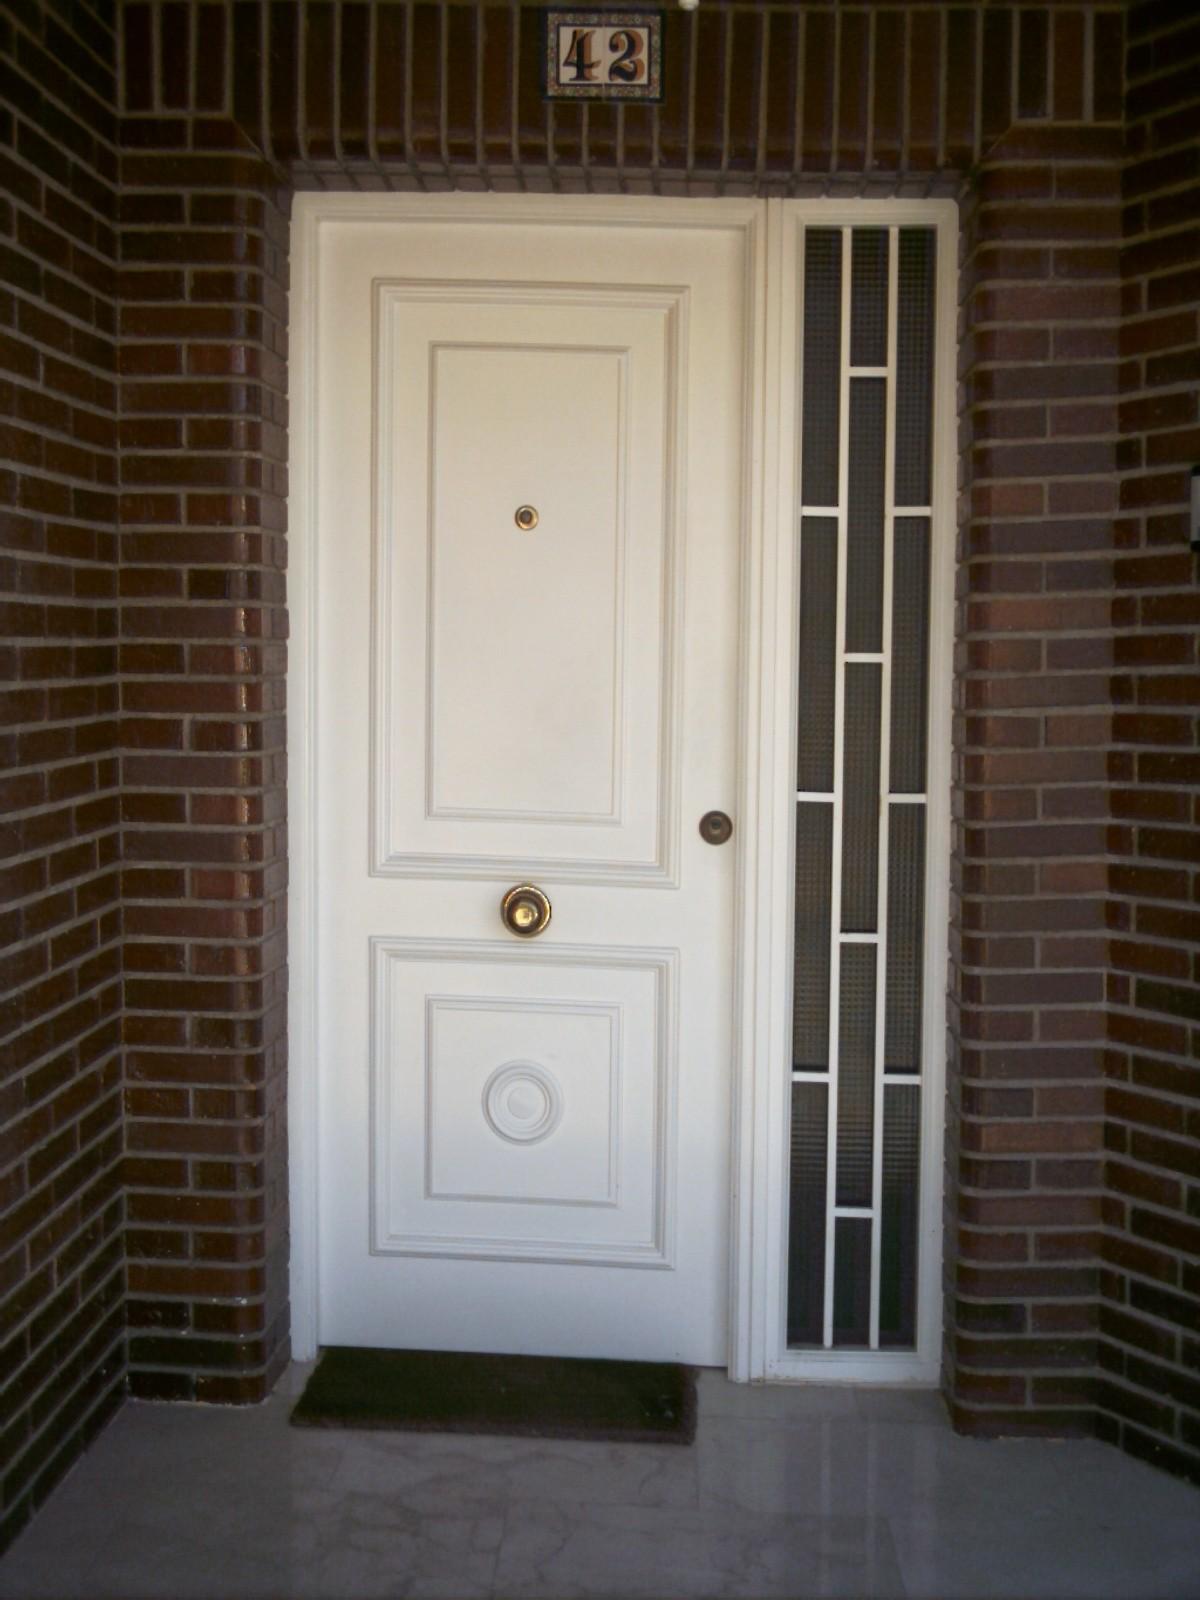 Fotos de puertas metalicas para casas latest perfect top for Puertas metalicas para casa